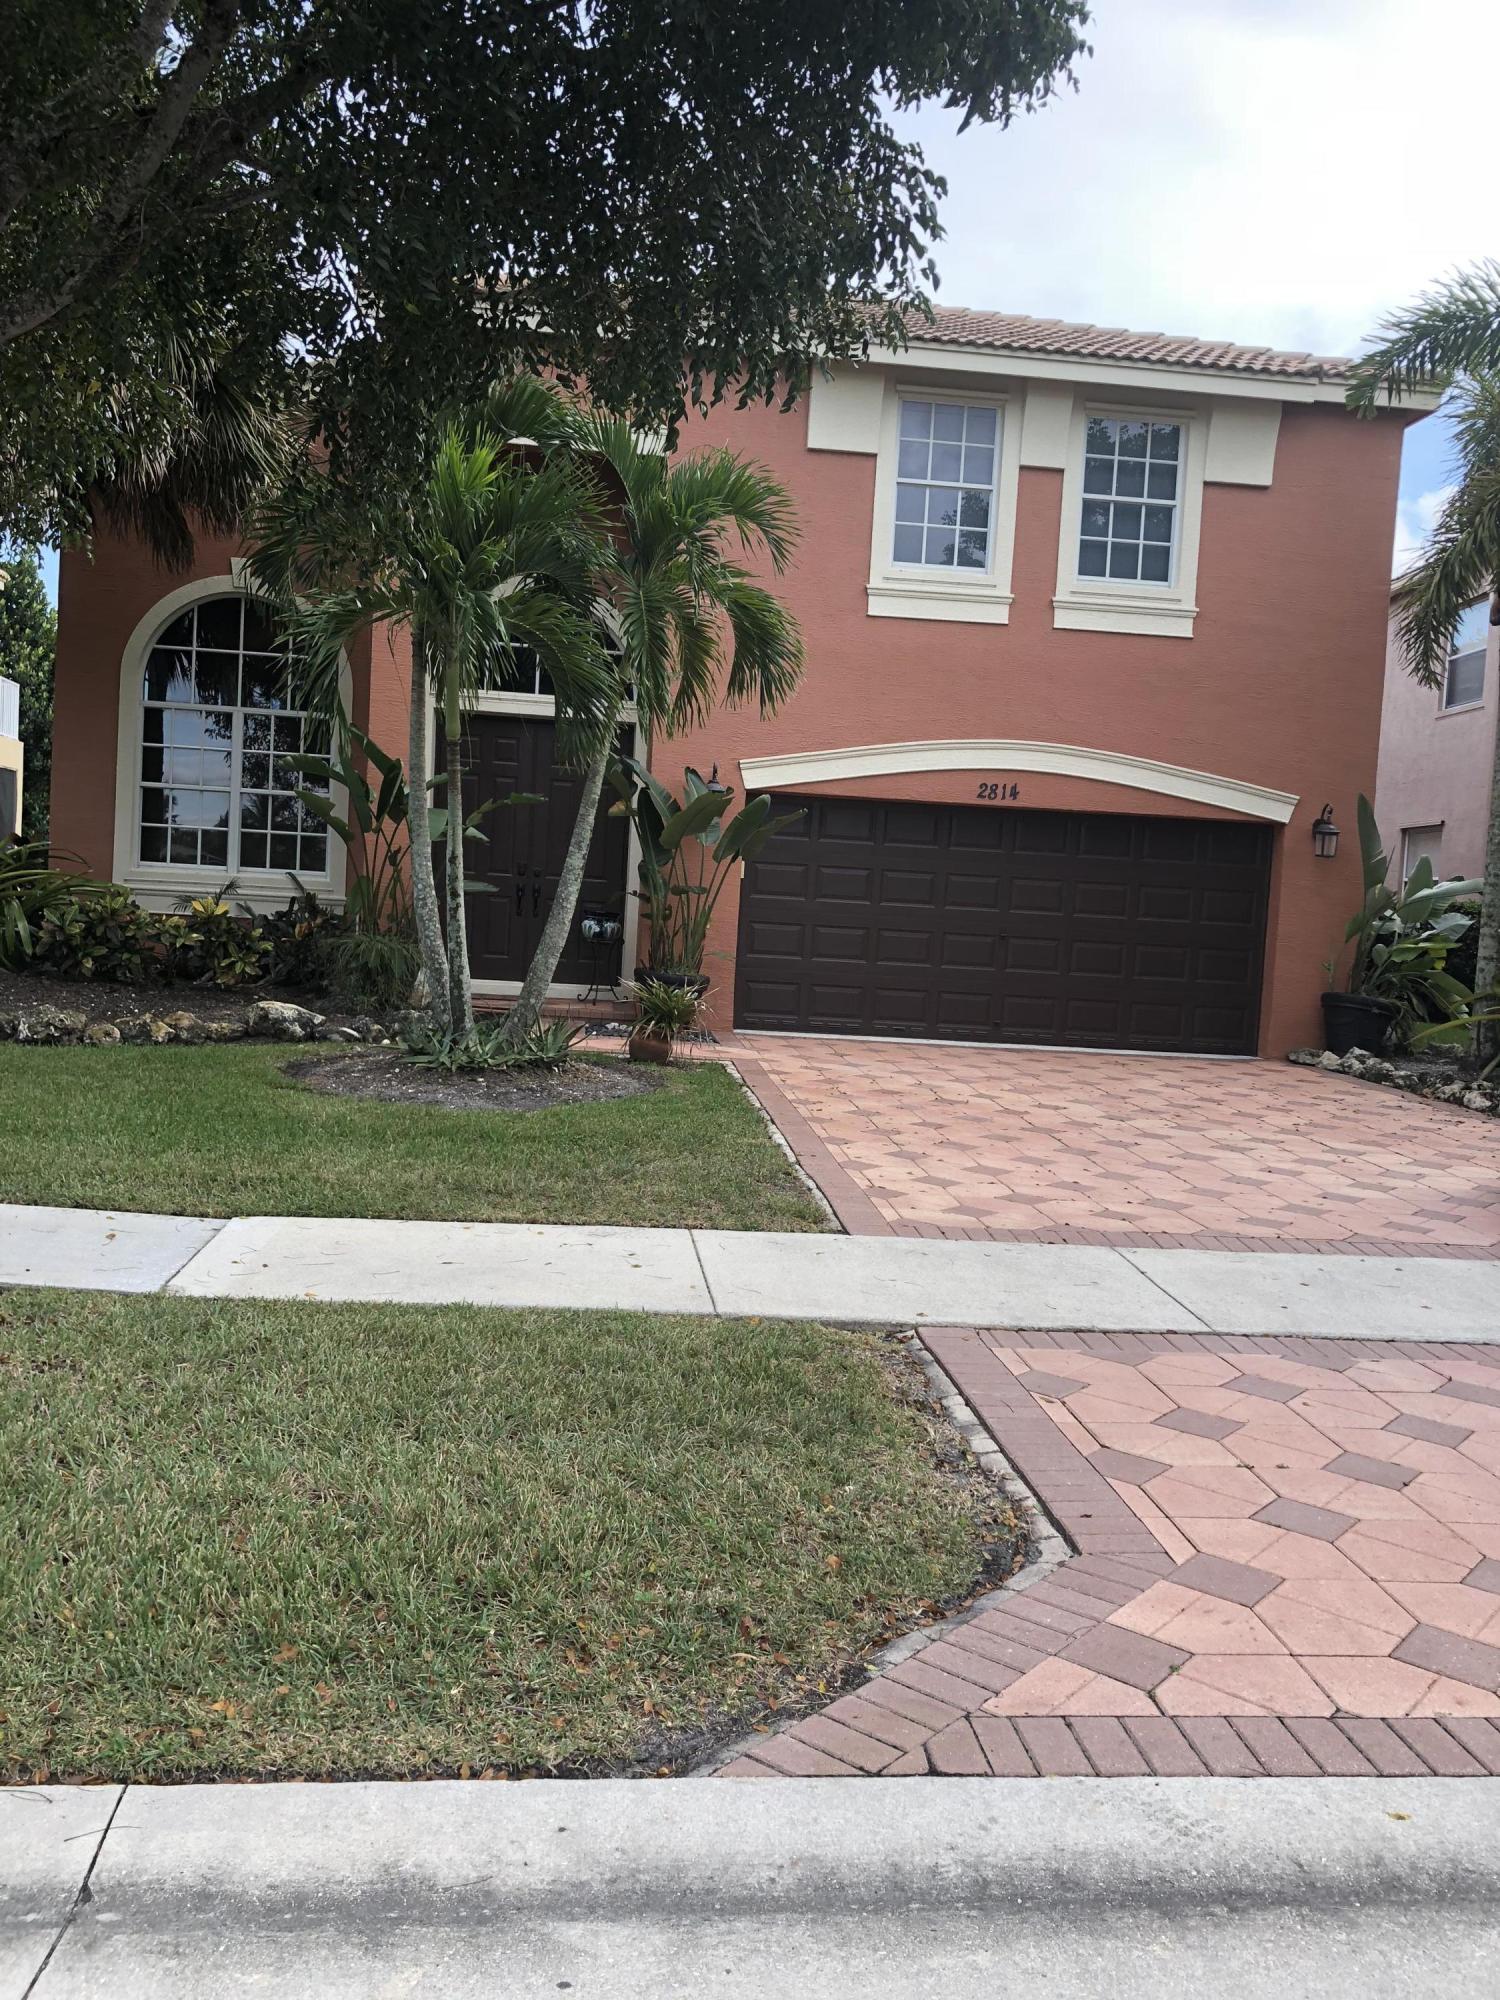 Photo of 2814 Misty Oaks Circle, Royal Palm Beach, FL 33411